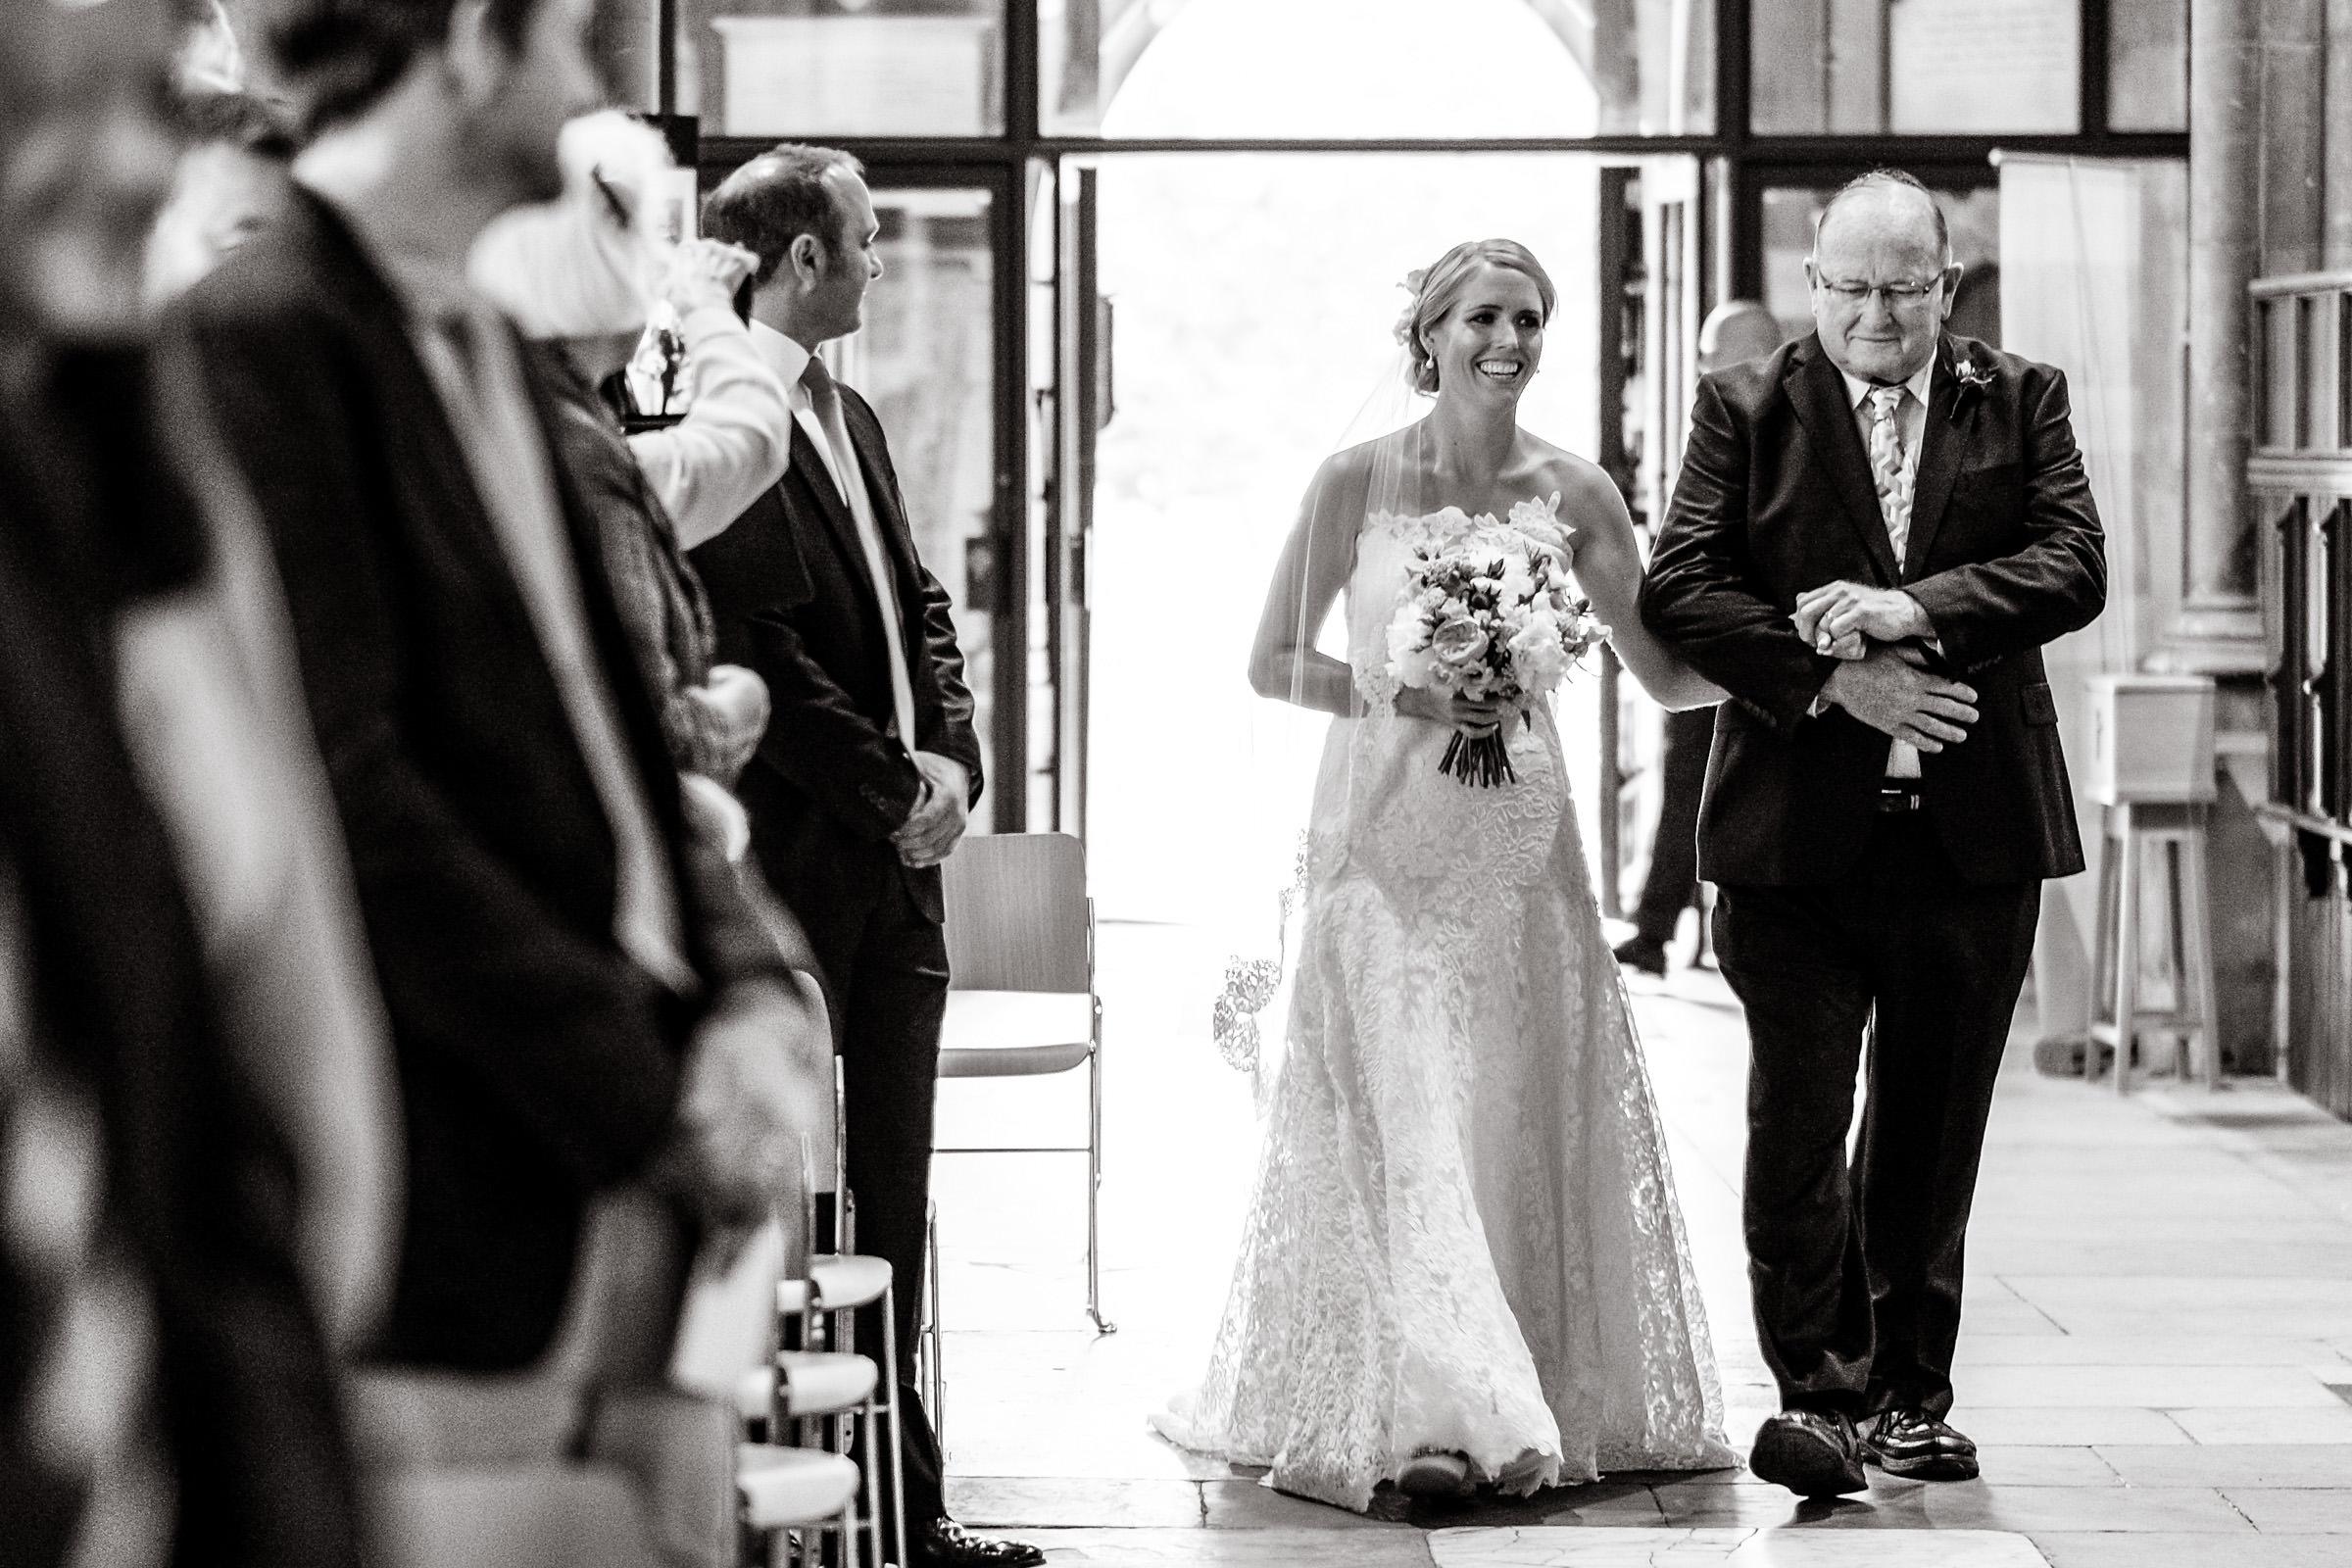 Wedding at St. Mary's Church in Surrey 009.jpg